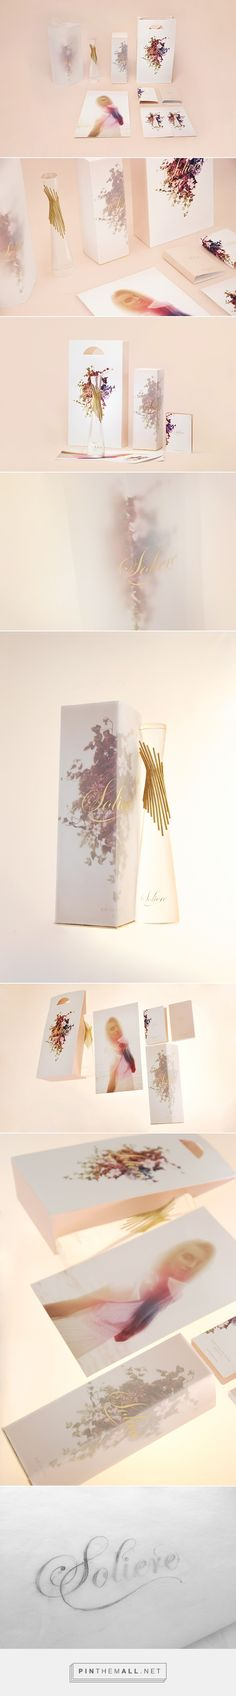 La marca de perfume Soliere en Behance